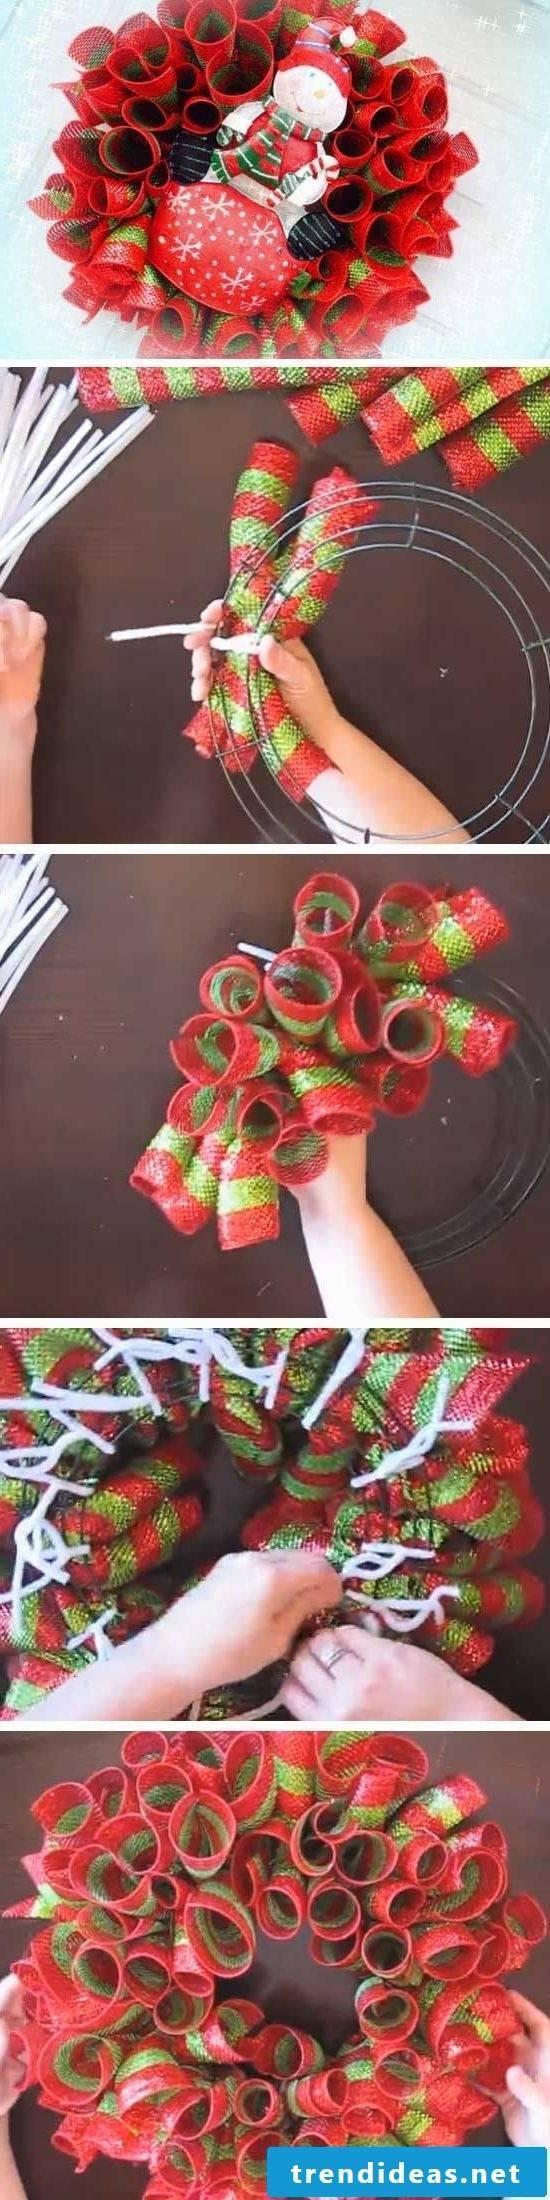 Net grinding wreath